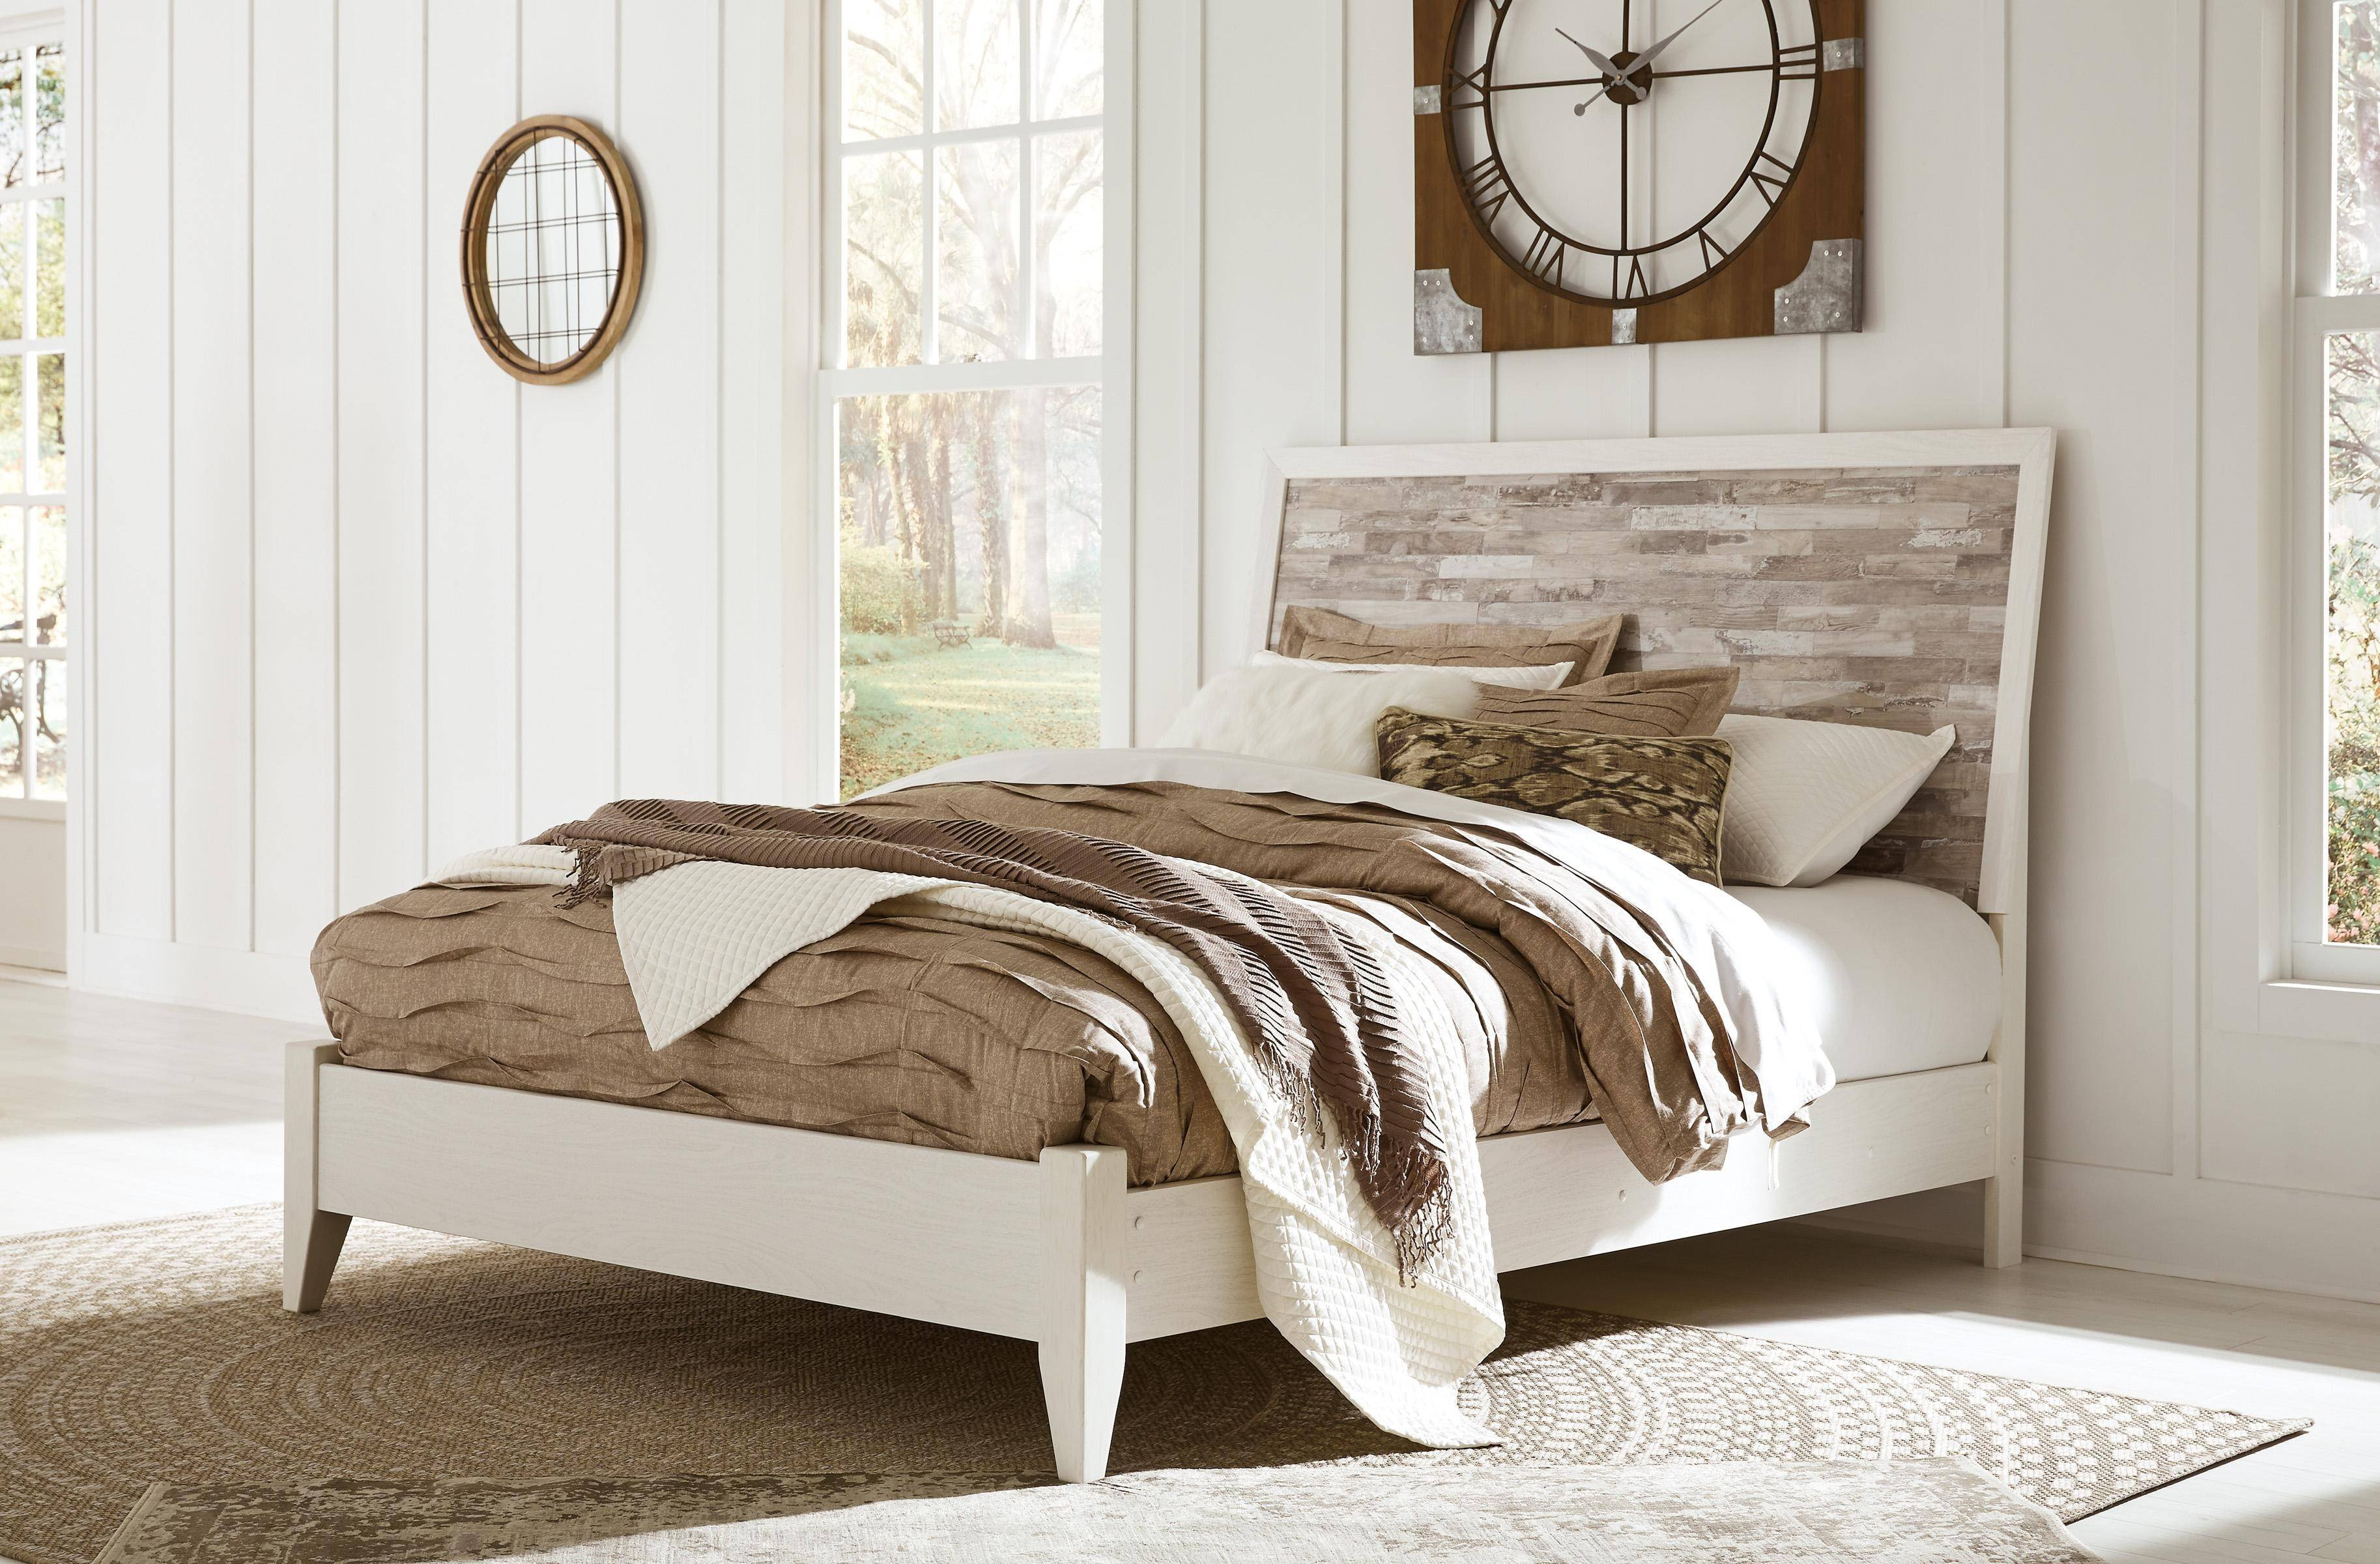 Ashley Home Store Bedroom Set Elegant ashley Evanni B315 Queen Size Platform Bedroom Set 6pcs In